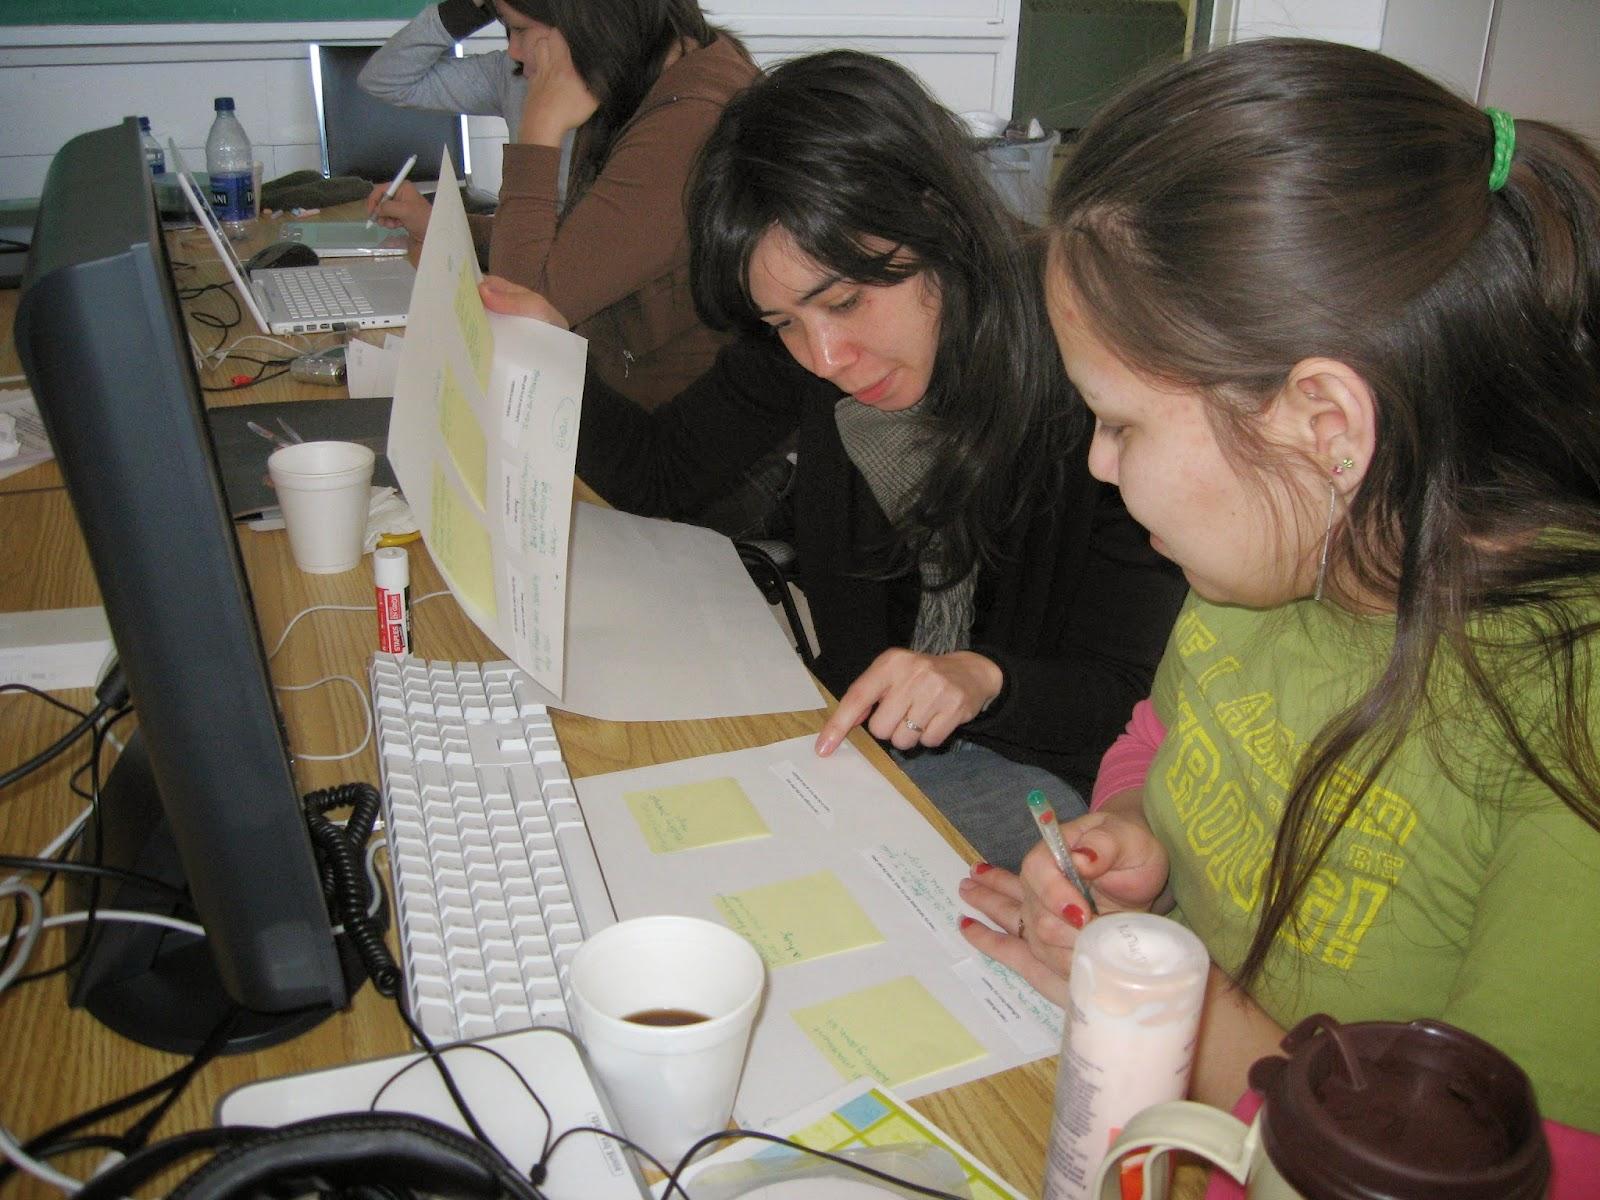 Mentor Catrina and Sherylanne make plans for media gathering